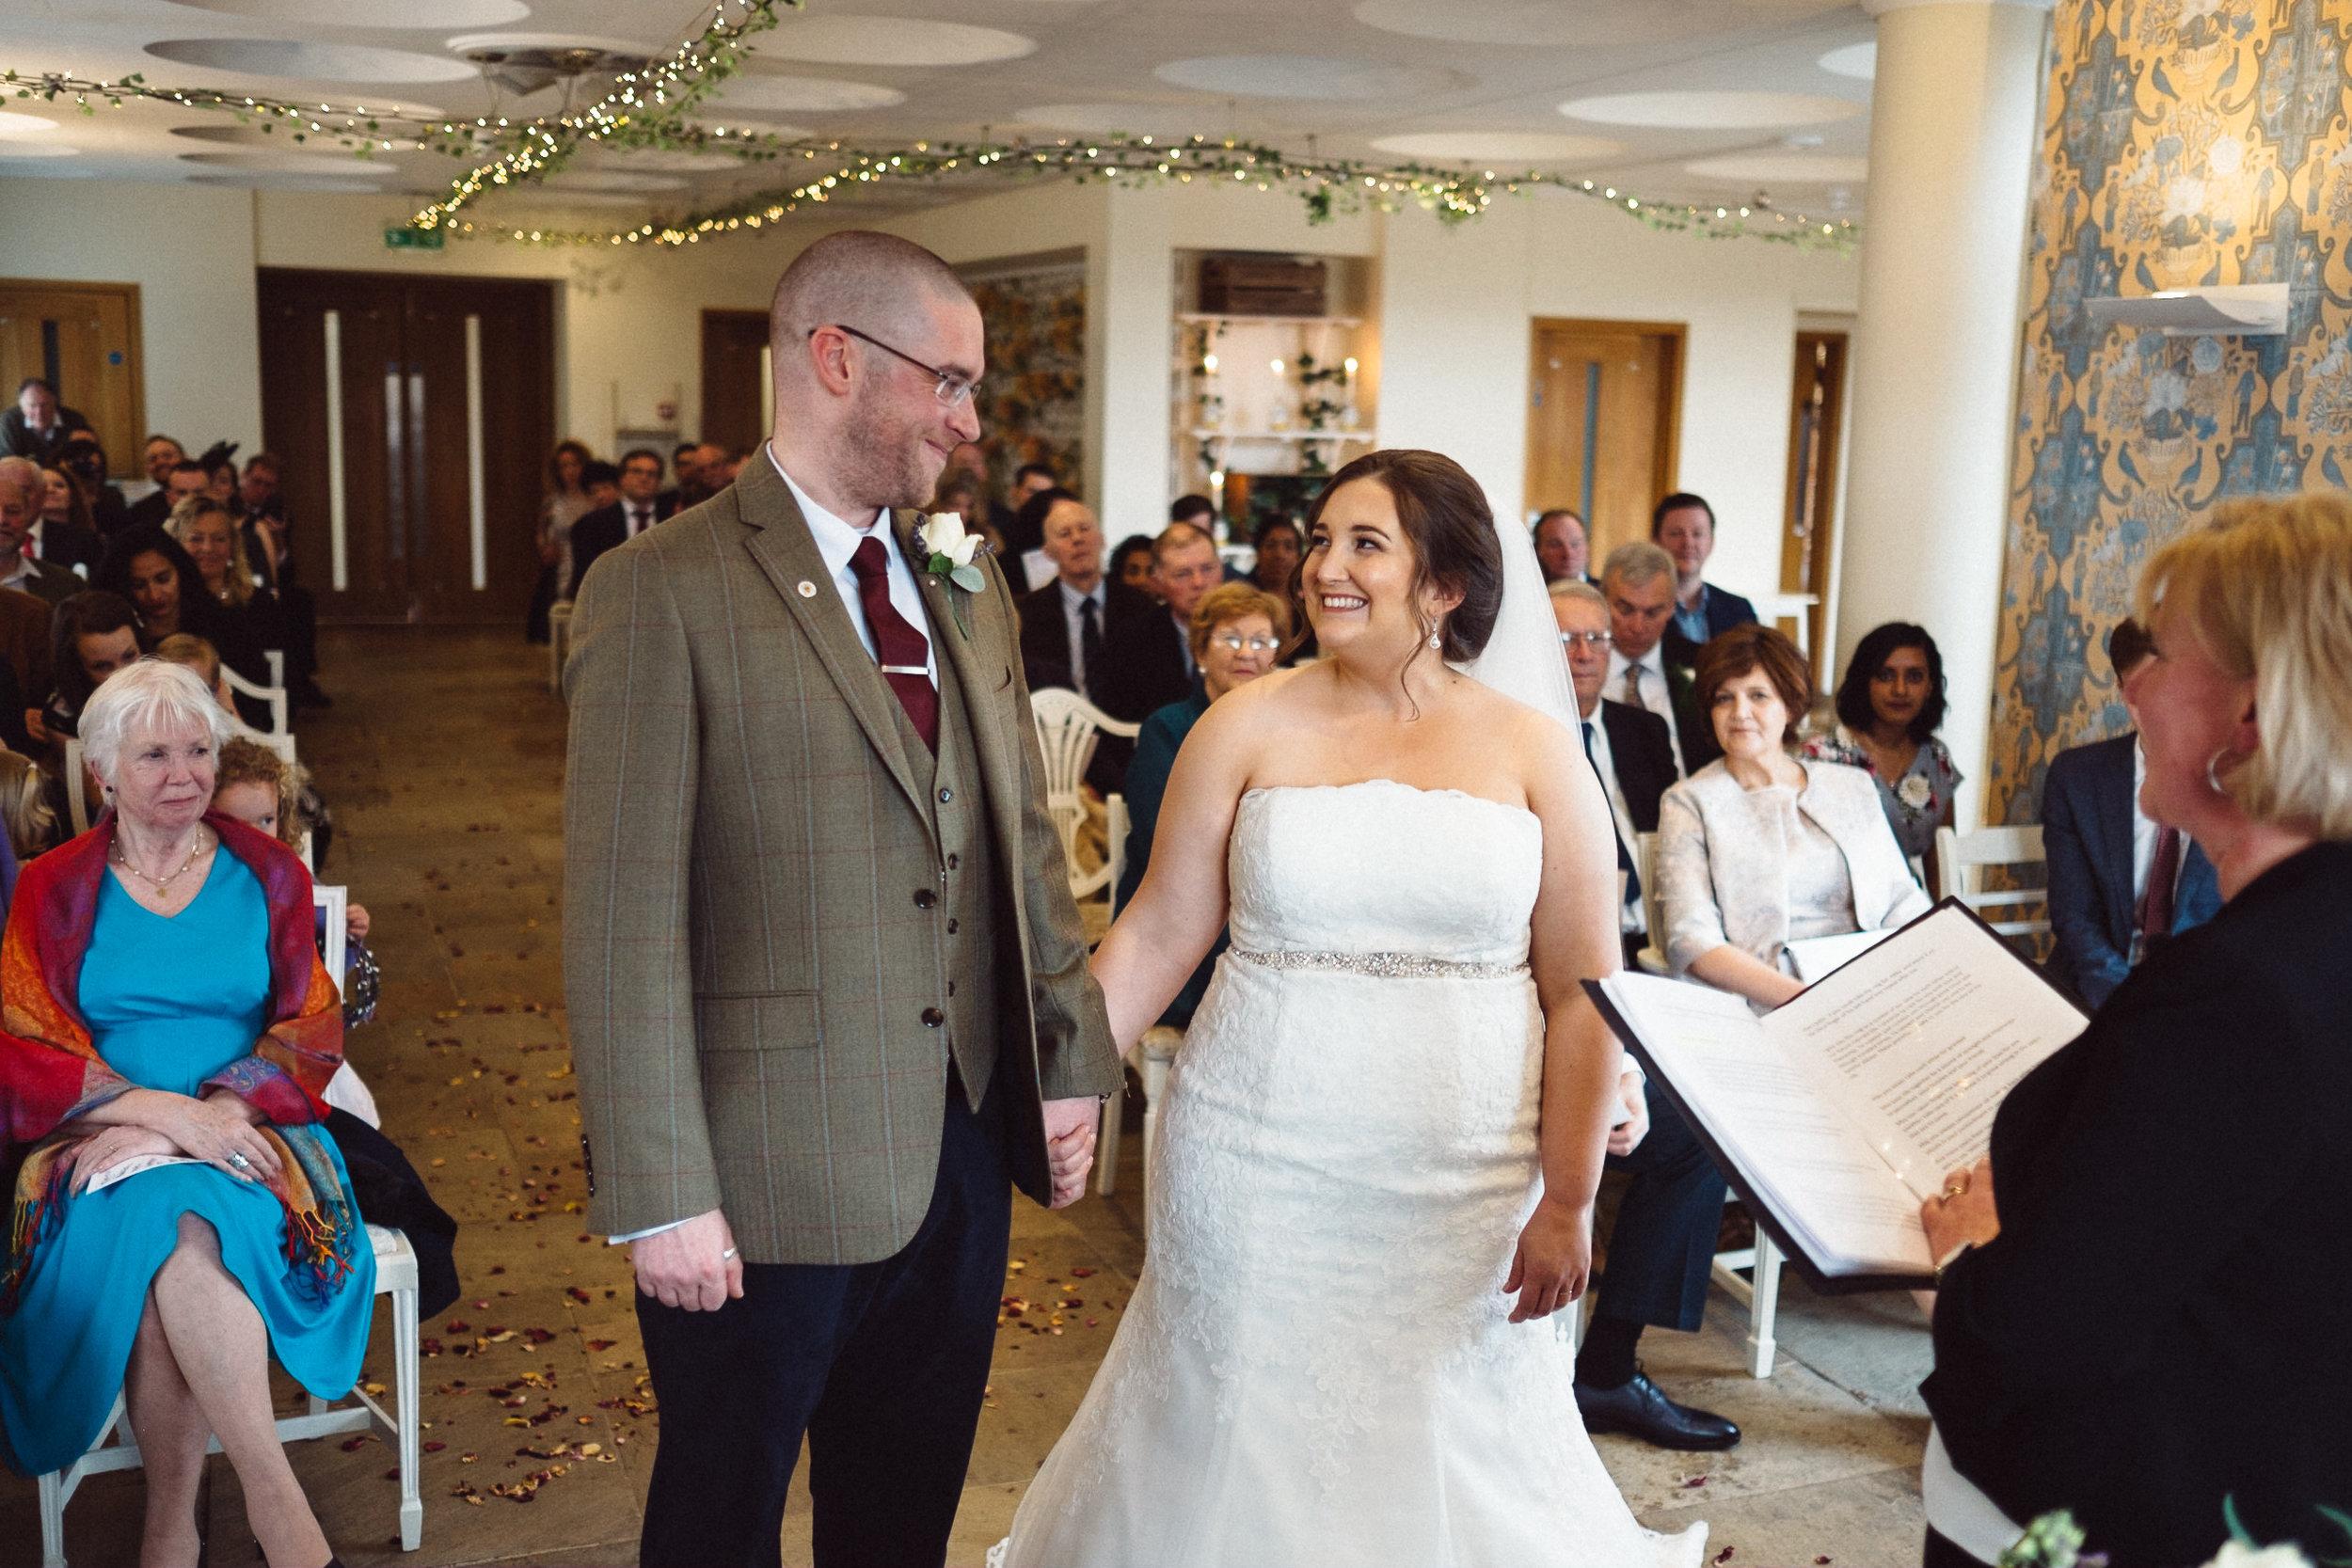 Hereford_wedding_photographer52.jpg